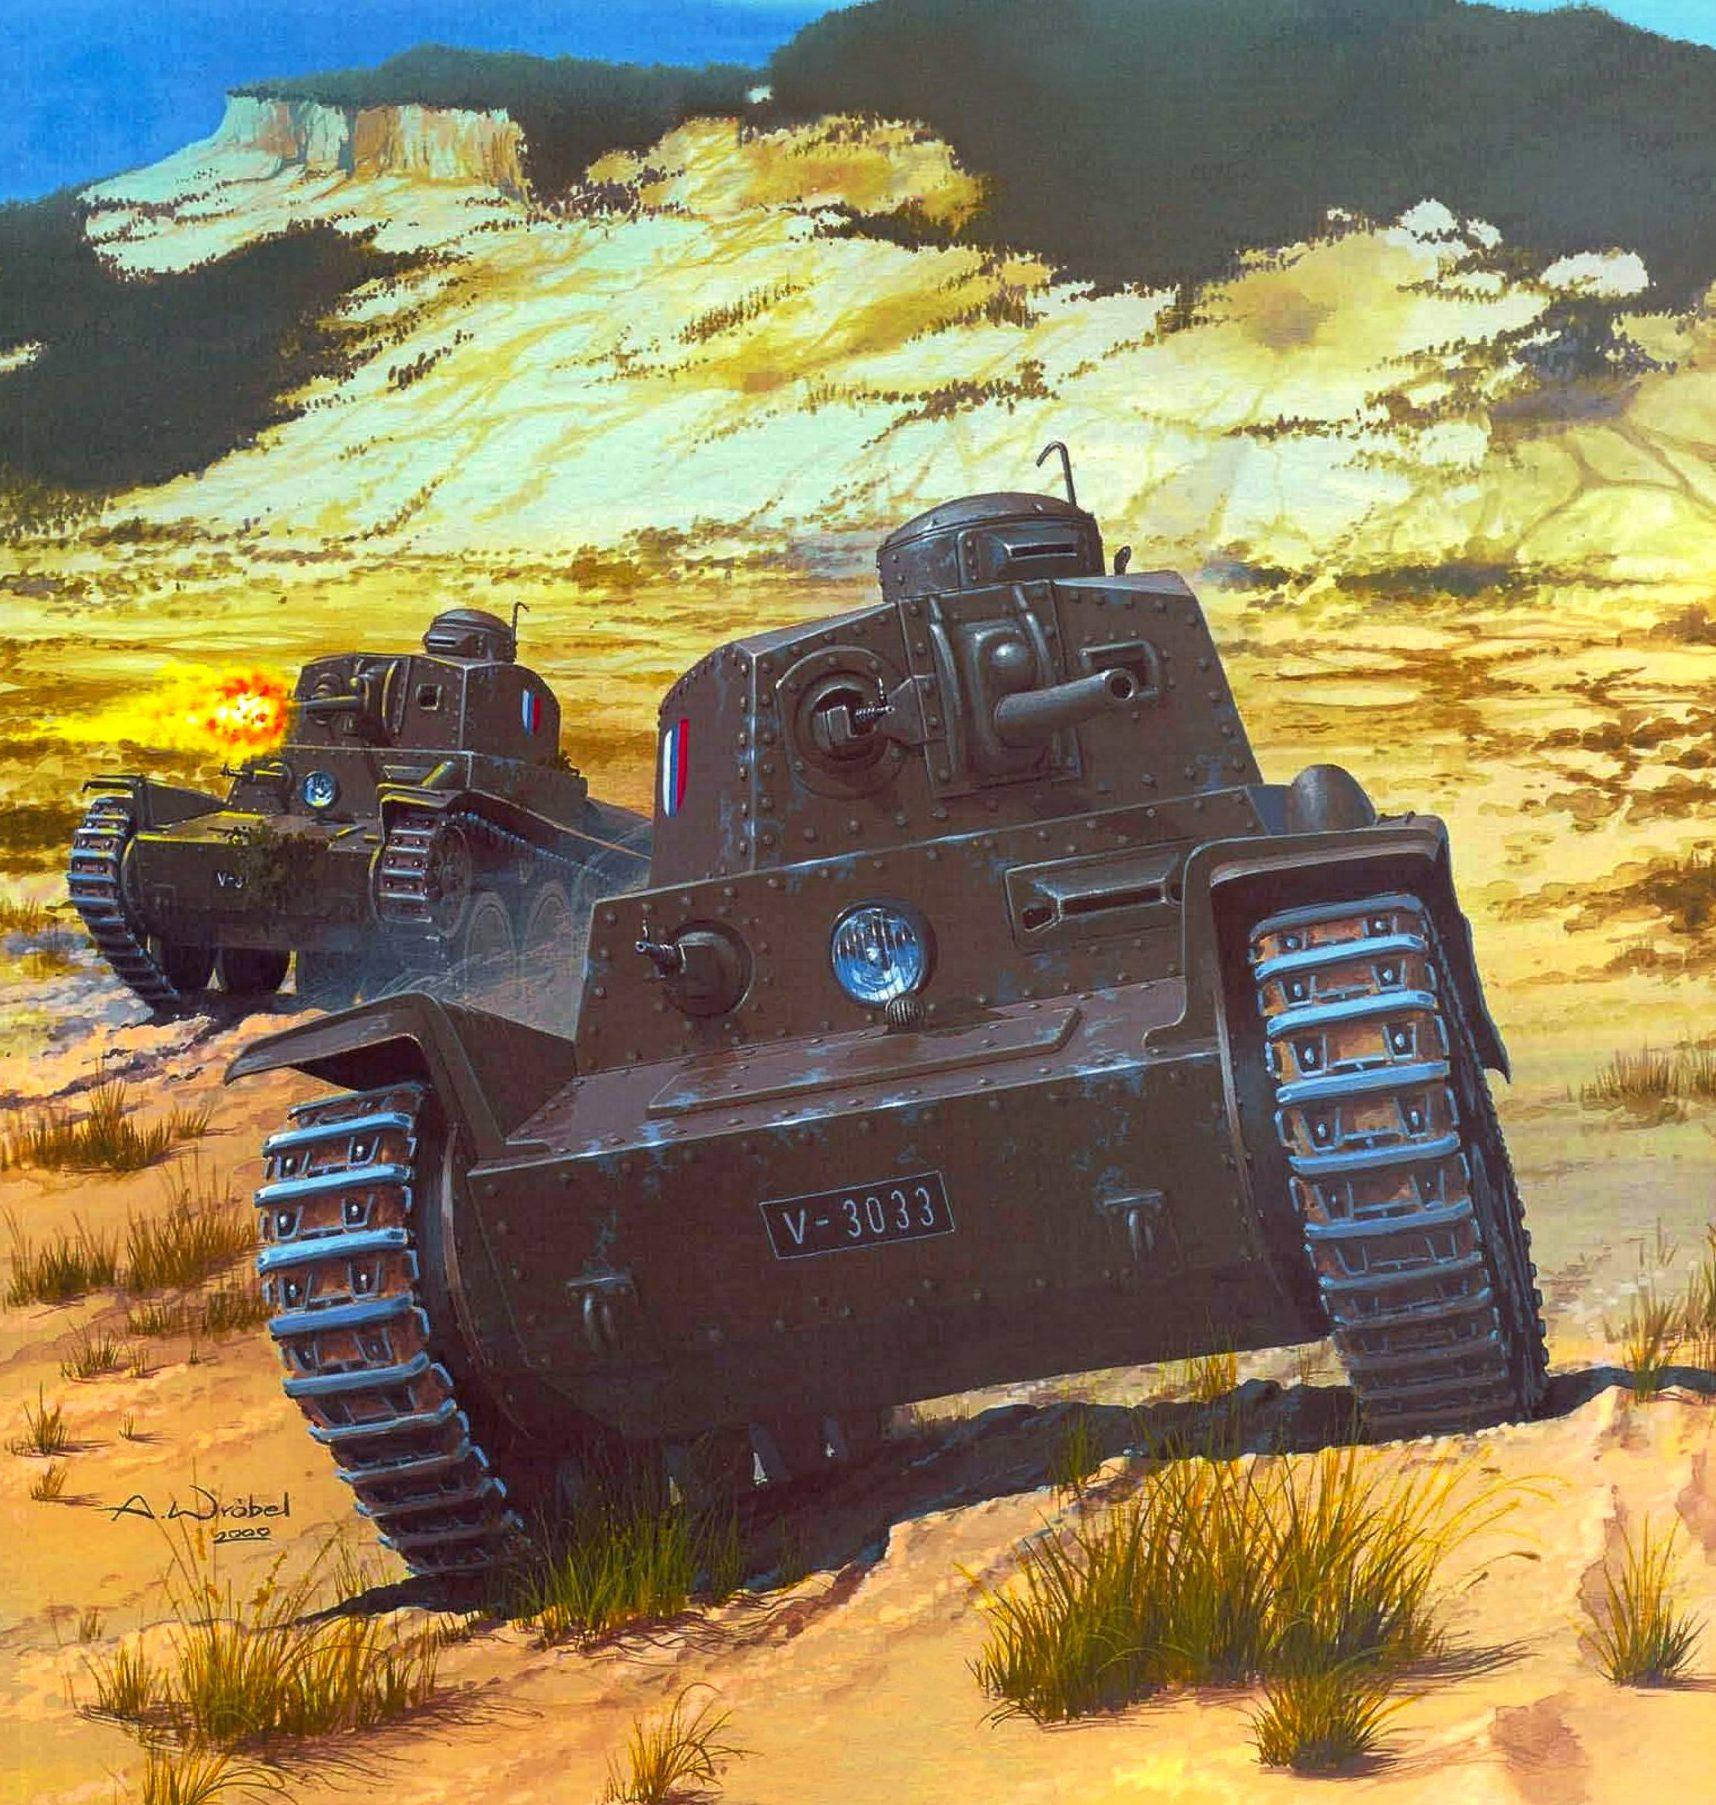 Wróbel Arkadiusz. Танк LT-40.